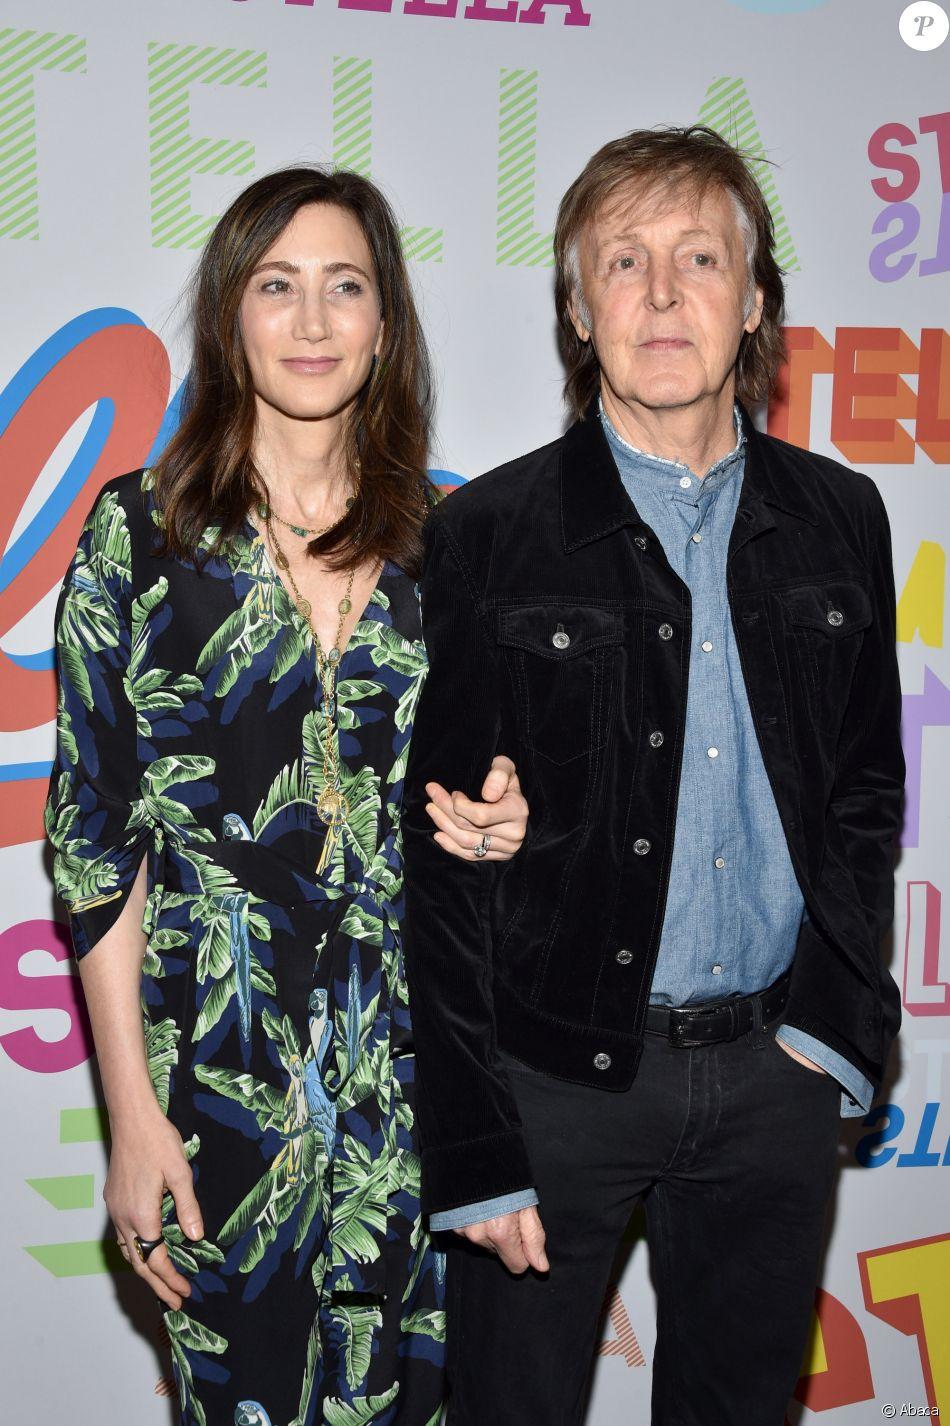 Nancy Shevell et Sir Paul McCartney - Soirée de